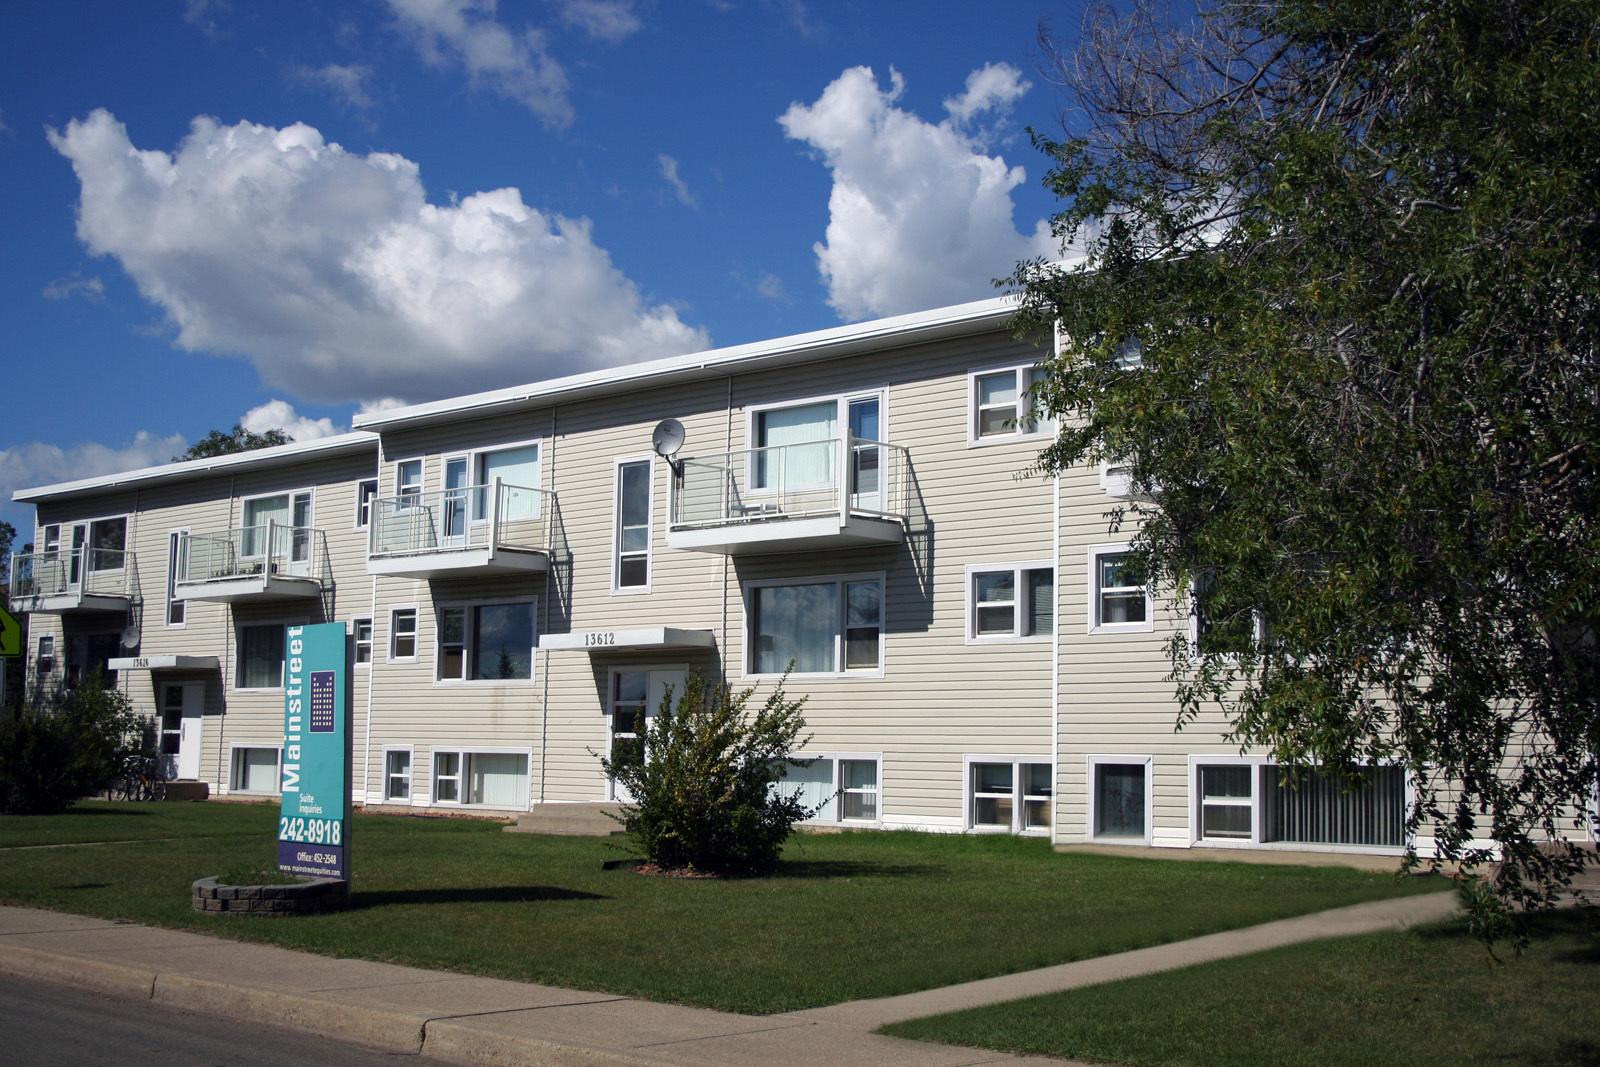 13608 109A Avenue NW, Edmonton, AB - $1,050